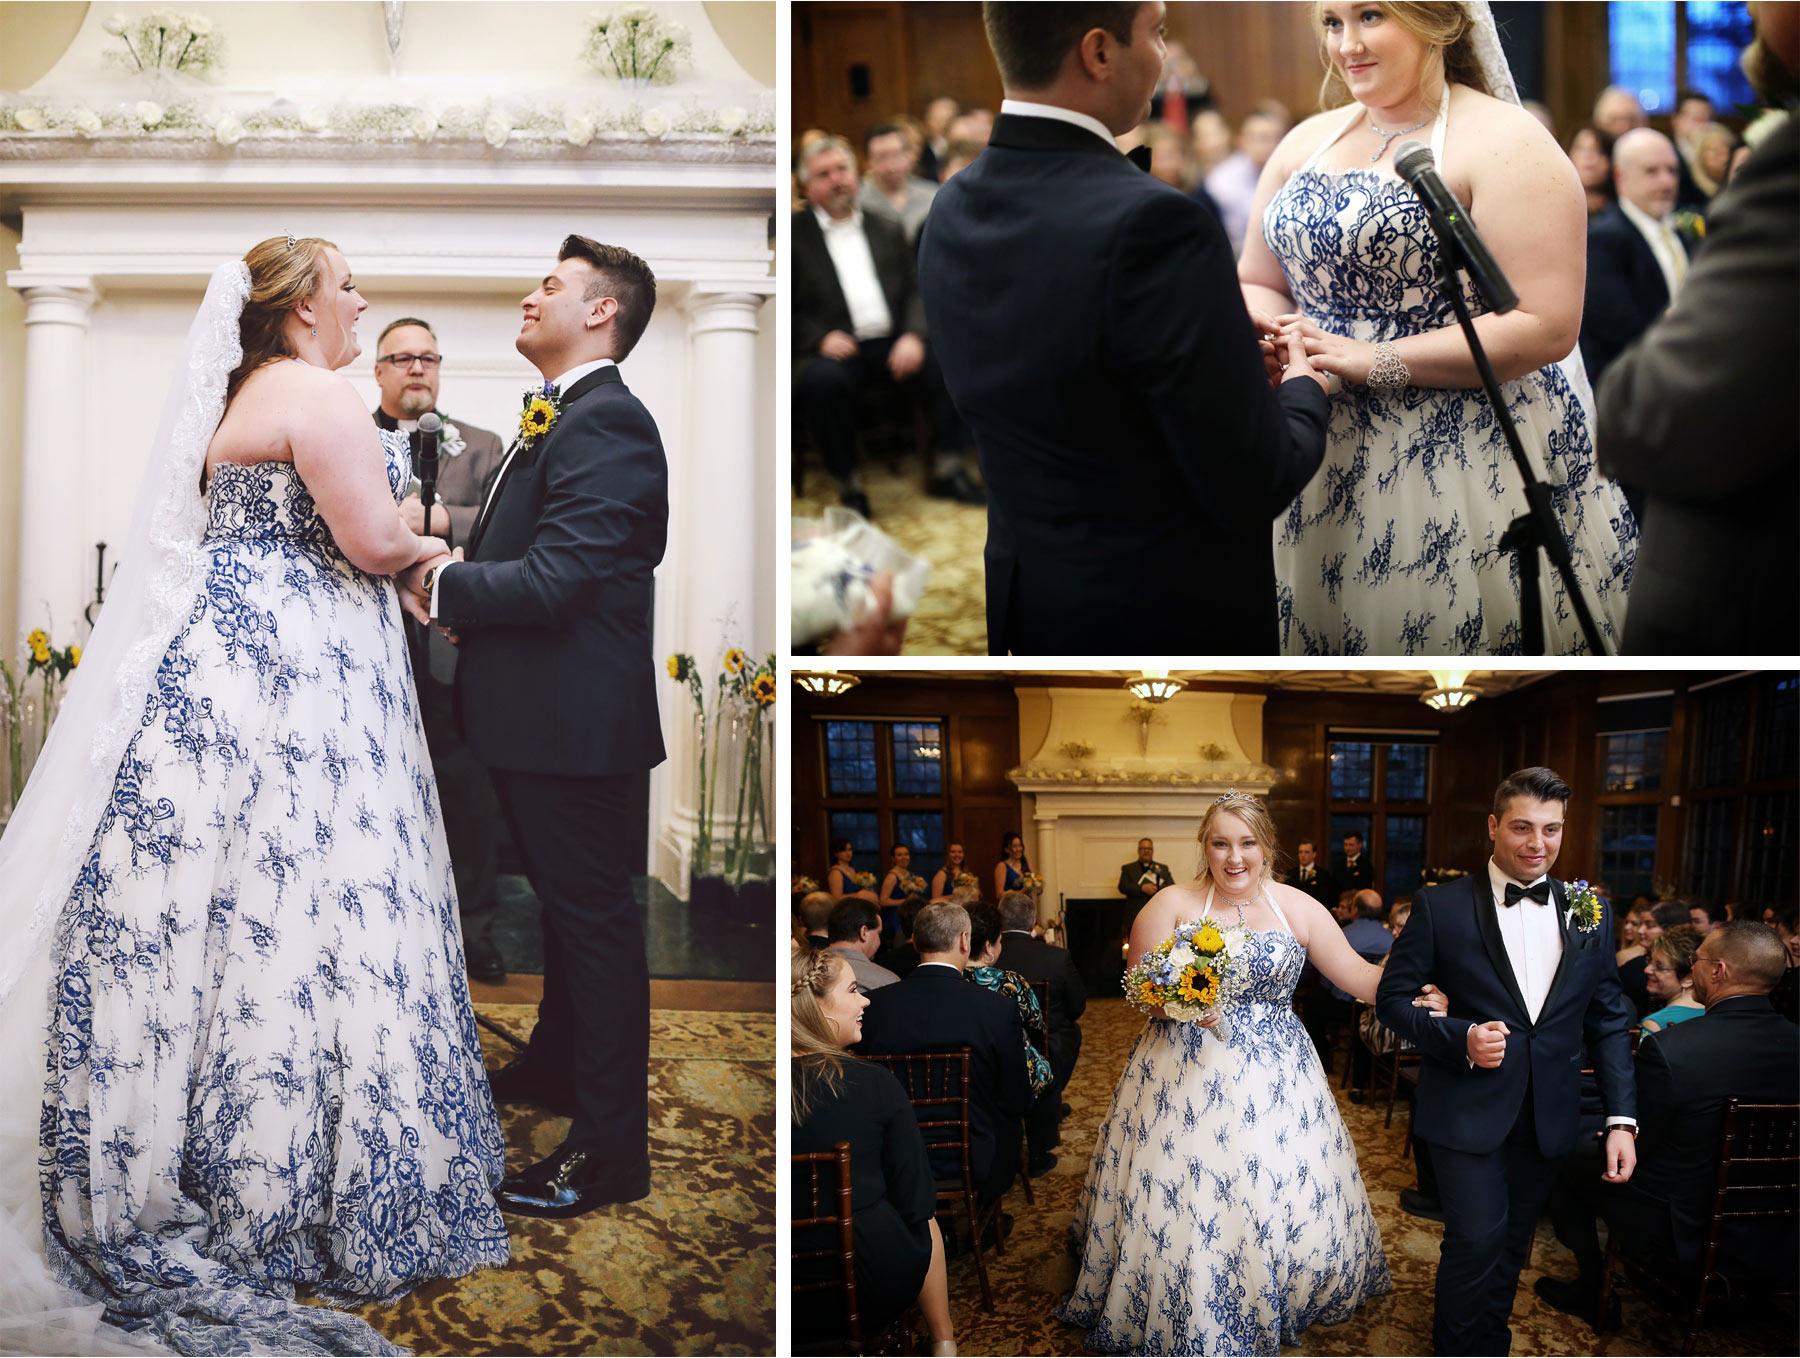 08-Saint-Paul-Minnesota-Wedding-Photography-by-Vick-Photography-The-University-Club-Ceremony-Mari-and-Giuseppe.jpg